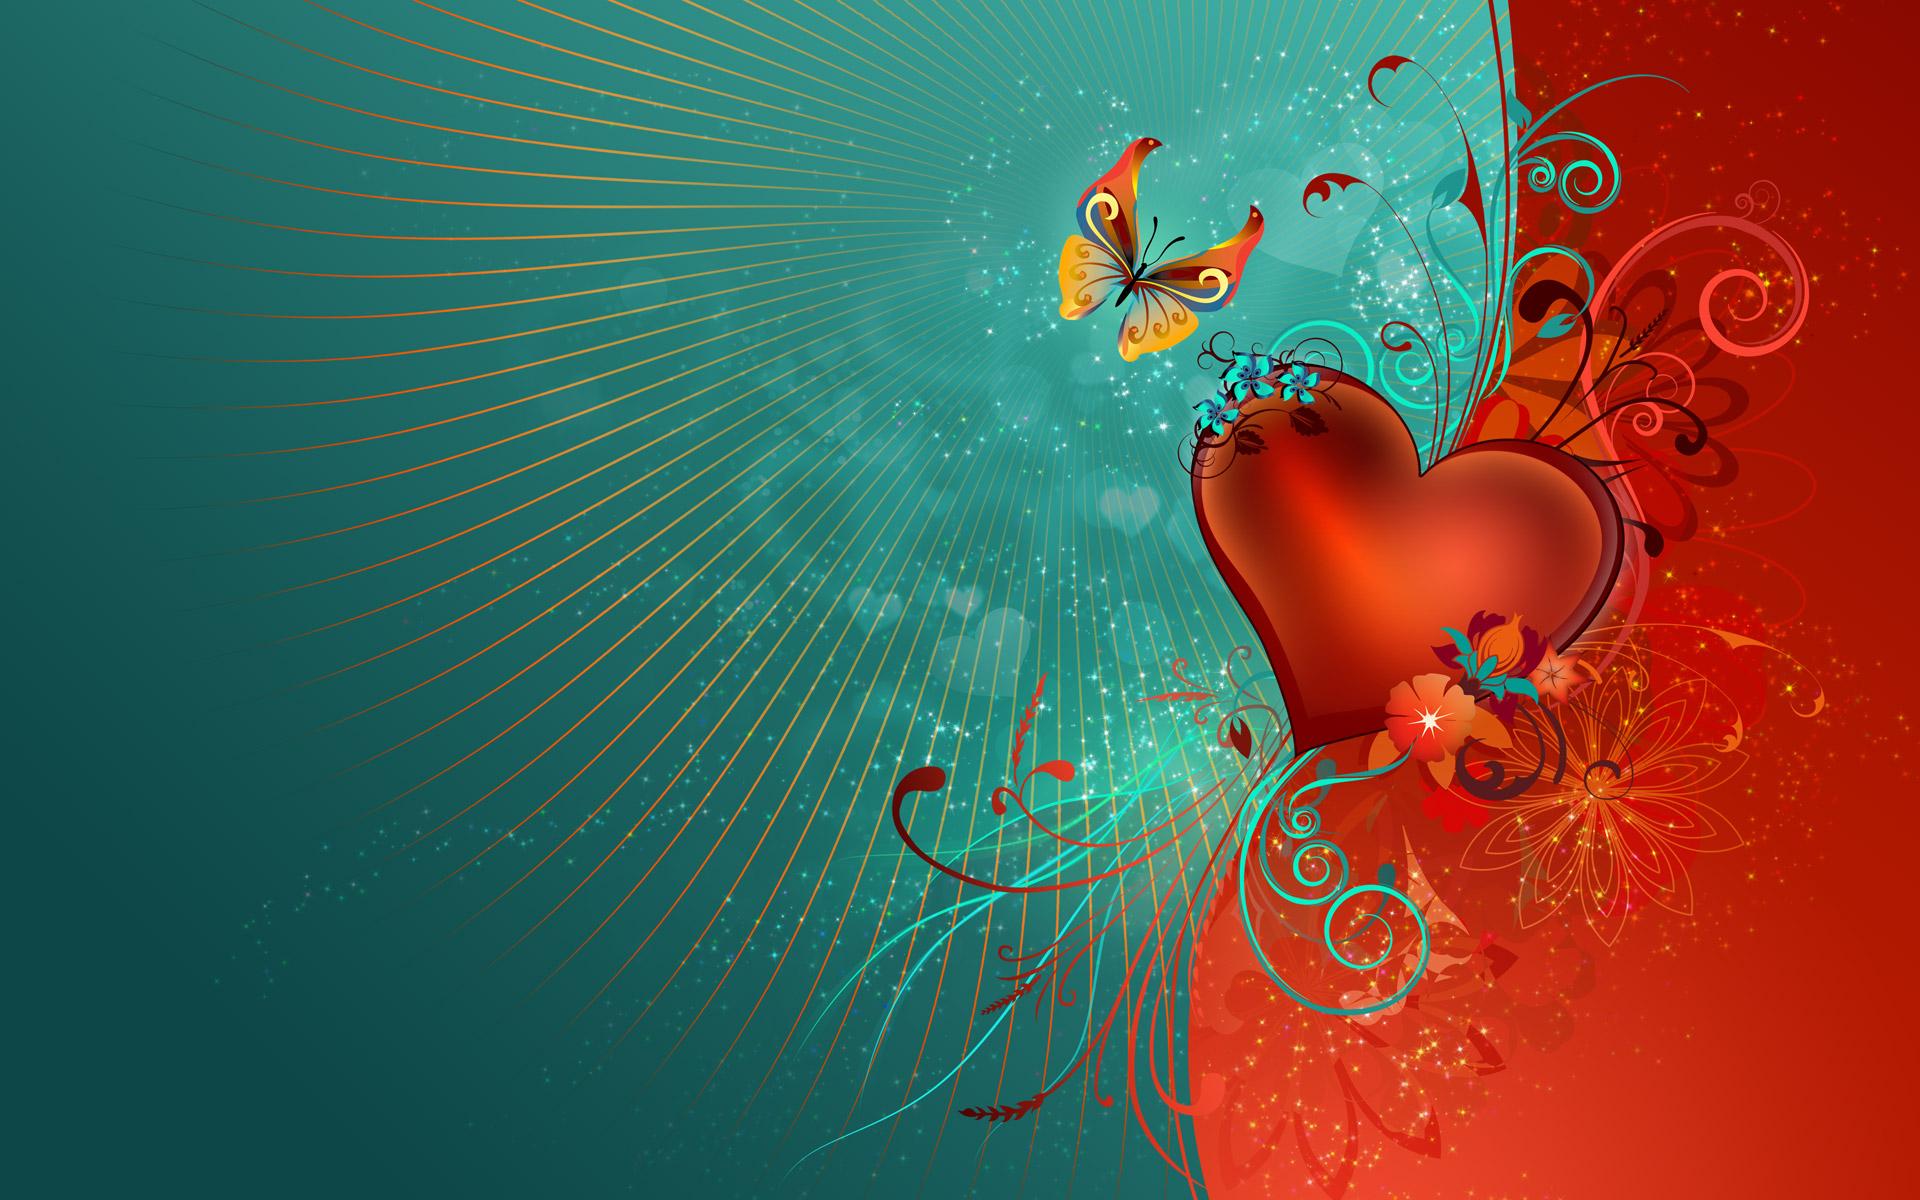 Valentines Day Clip Art 1920x1200